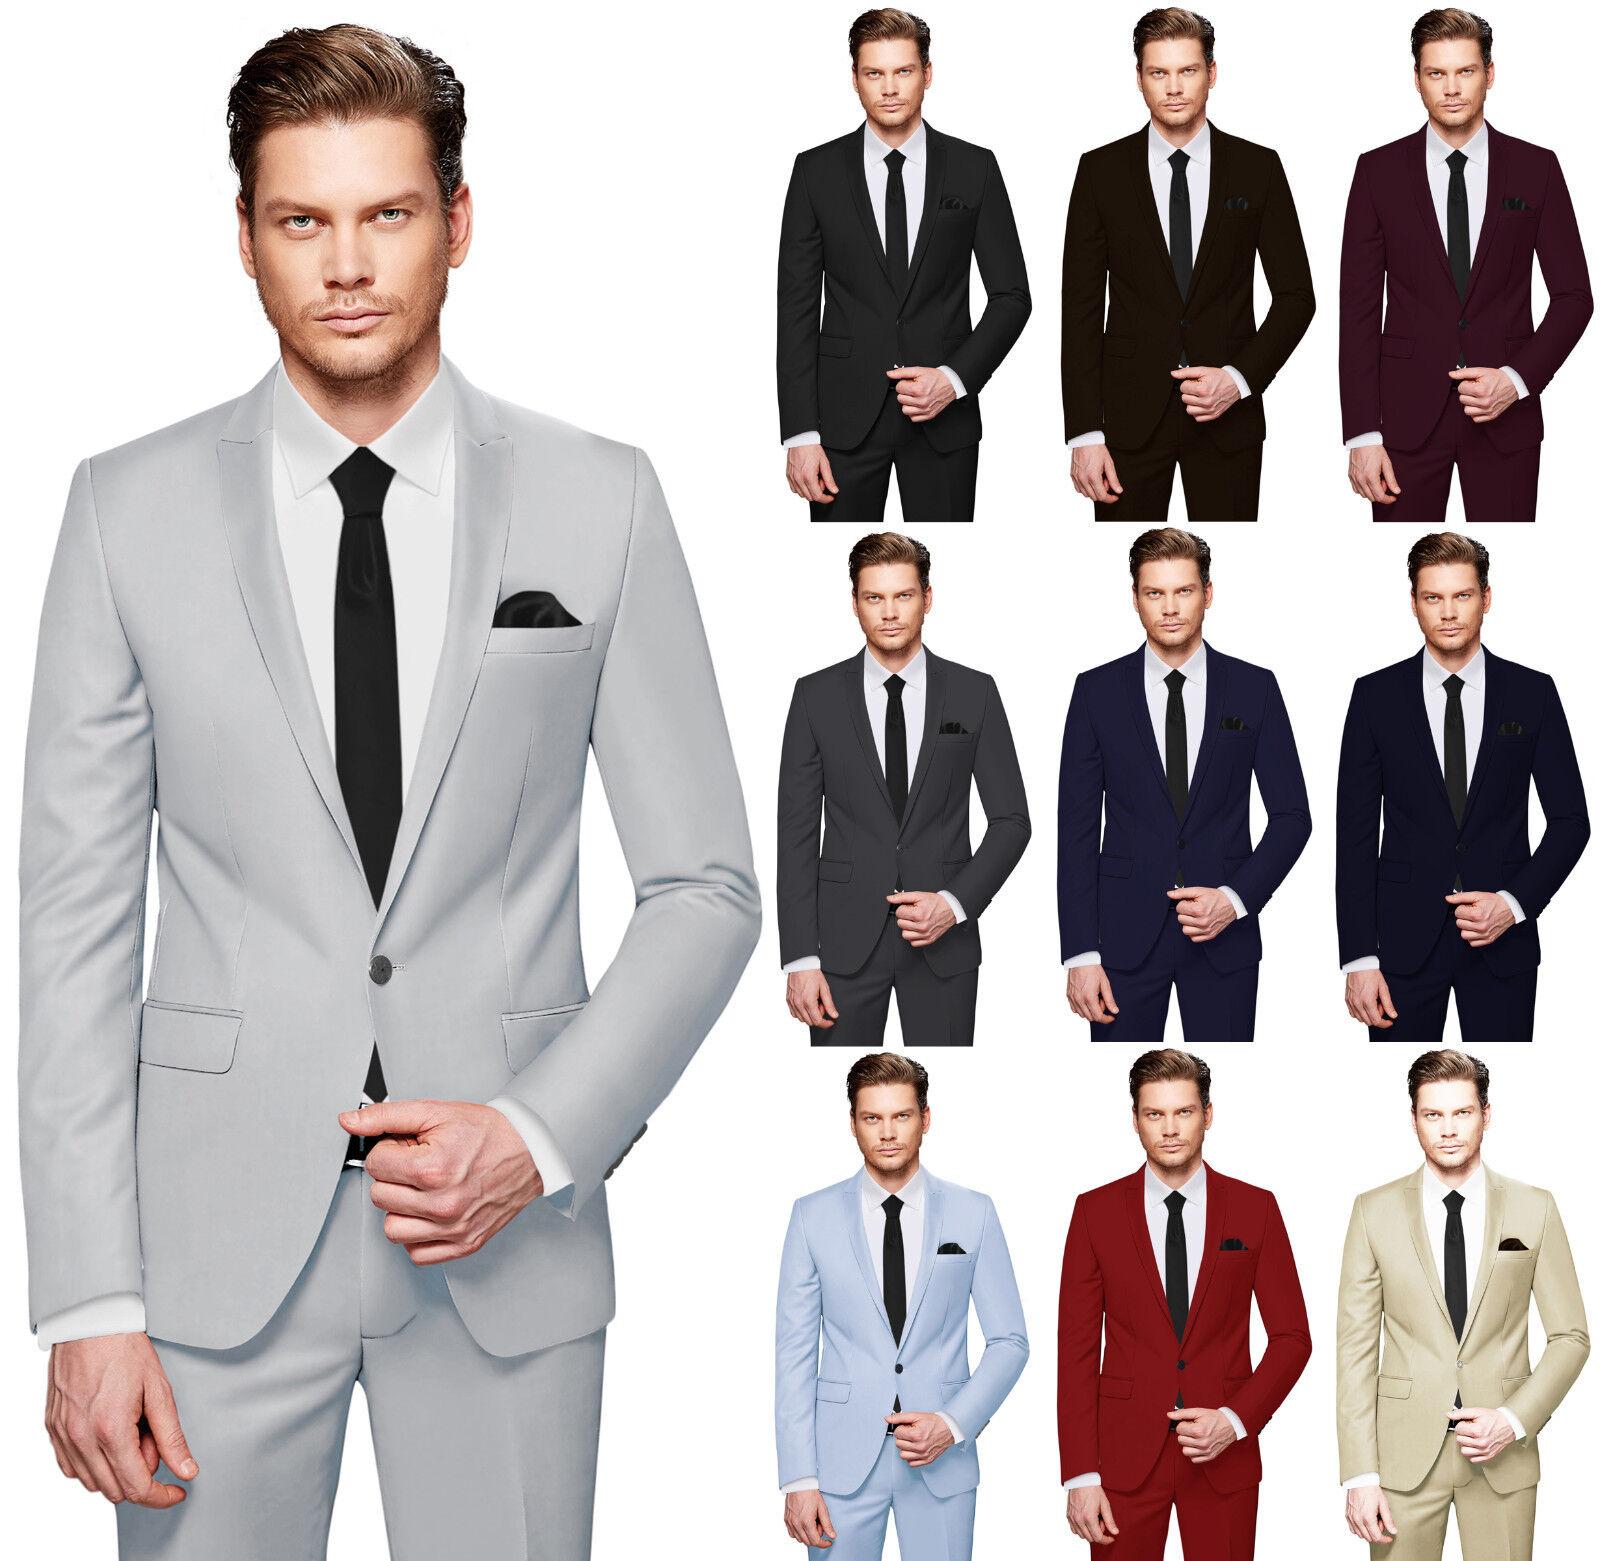 Crixus Men's Suit - 3 Piece Set - Slim Fit Tuxedo Wedding Business Cs _